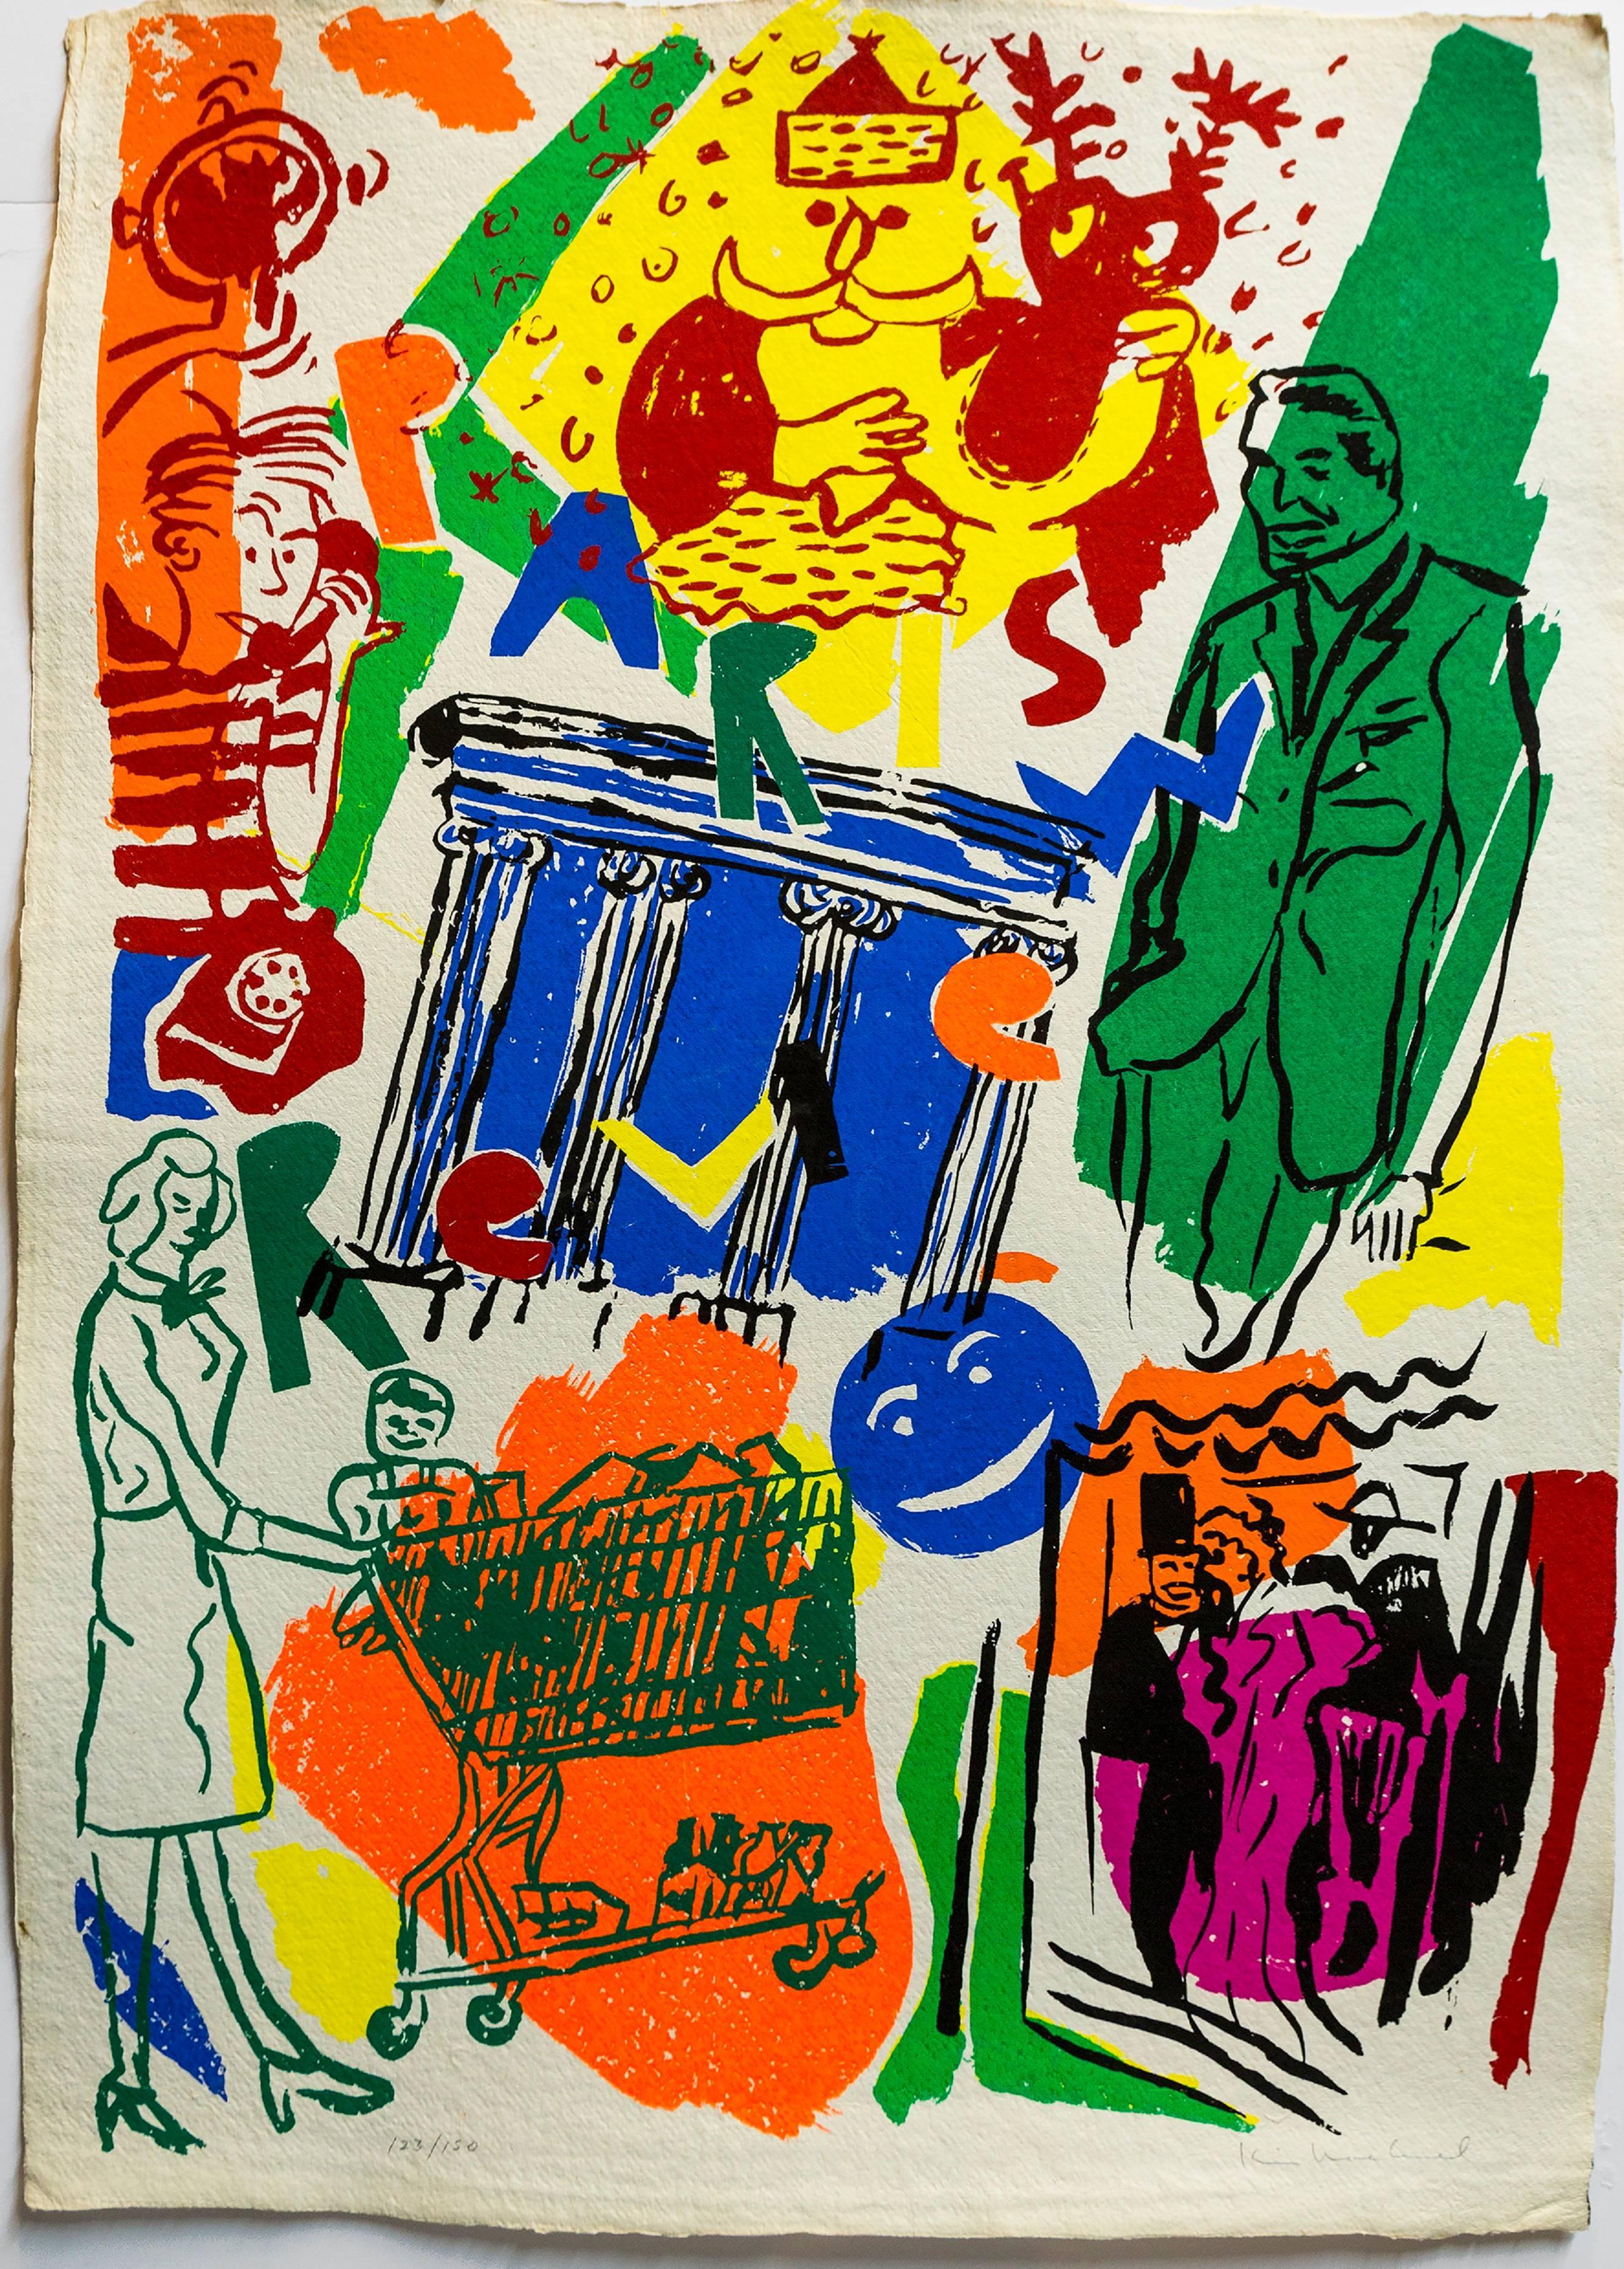 Paris Review hand signed 1982 Silkscreen Colorful Modernist